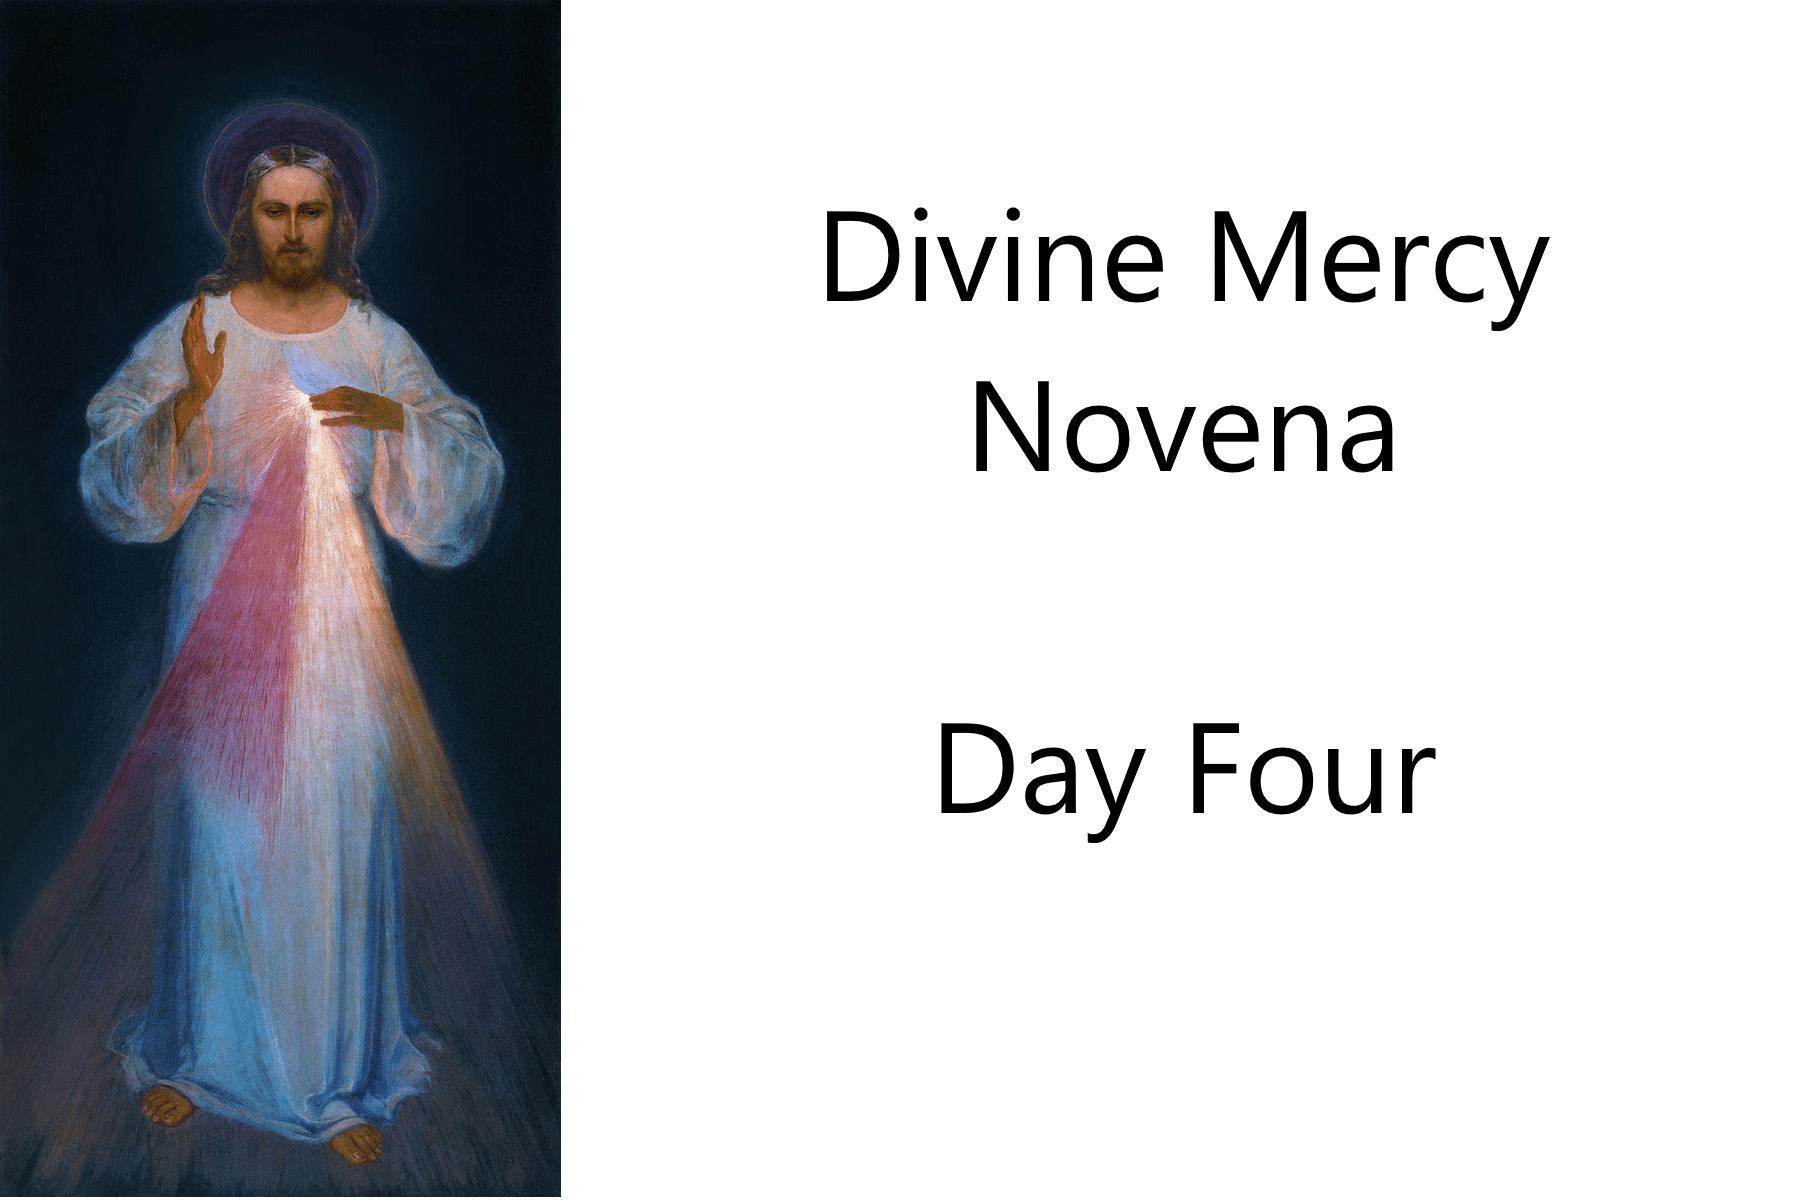 Divine Mercy Novena Day Four